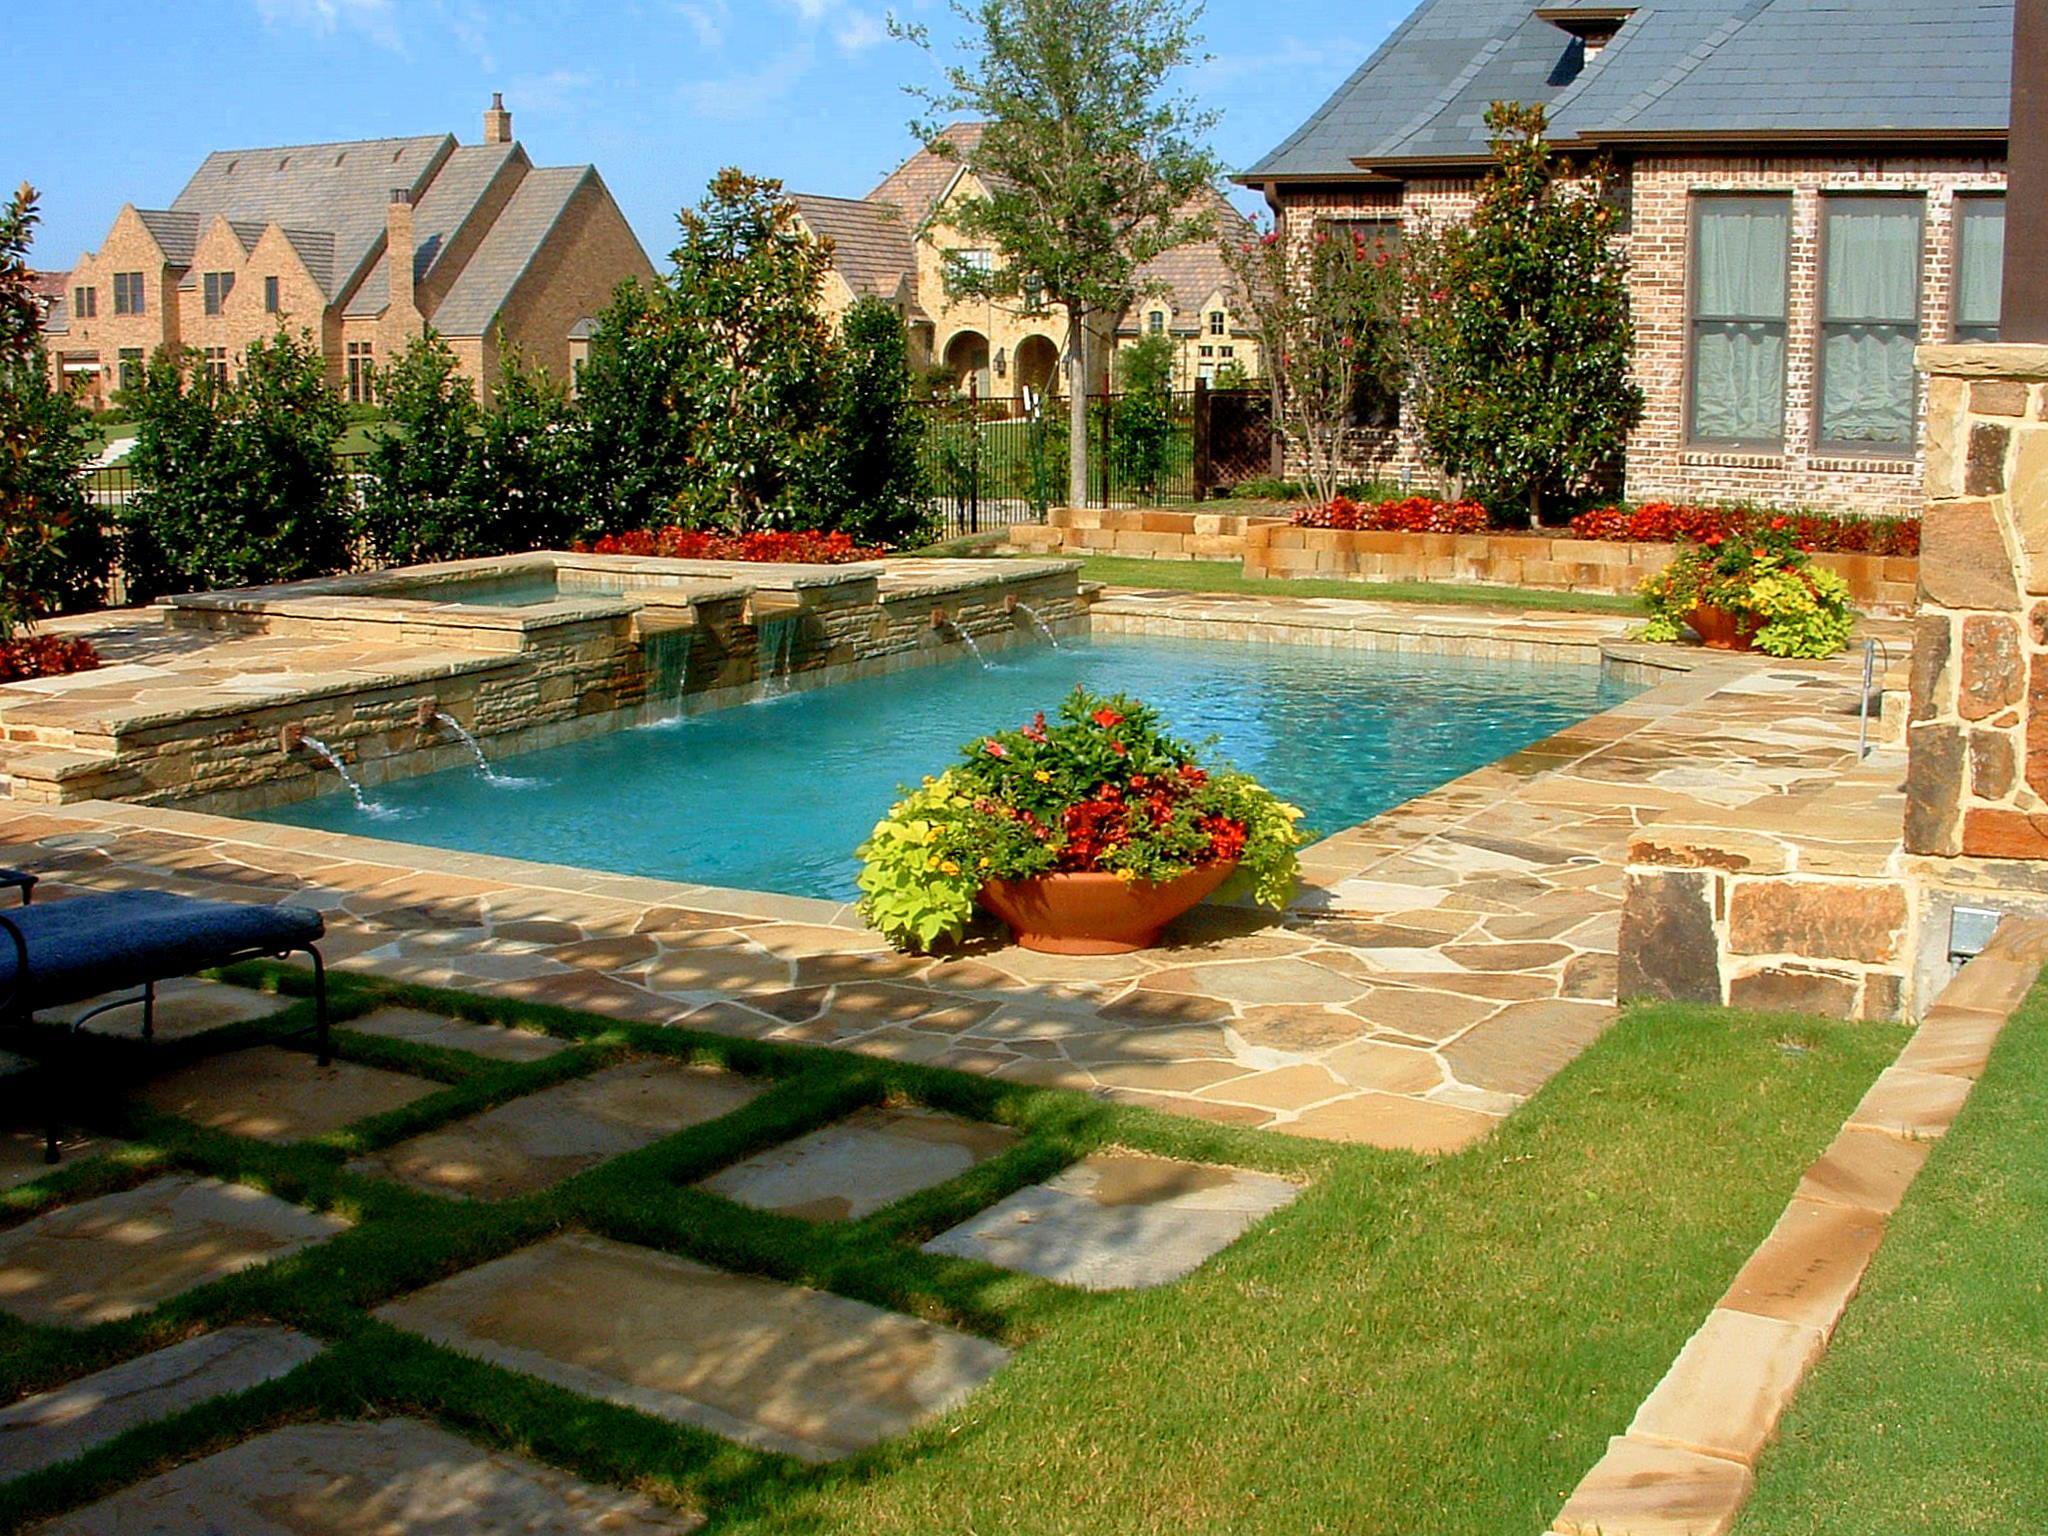 Pool Landscape Design  Backyard Landscaping Ideas Swimming Pool Design